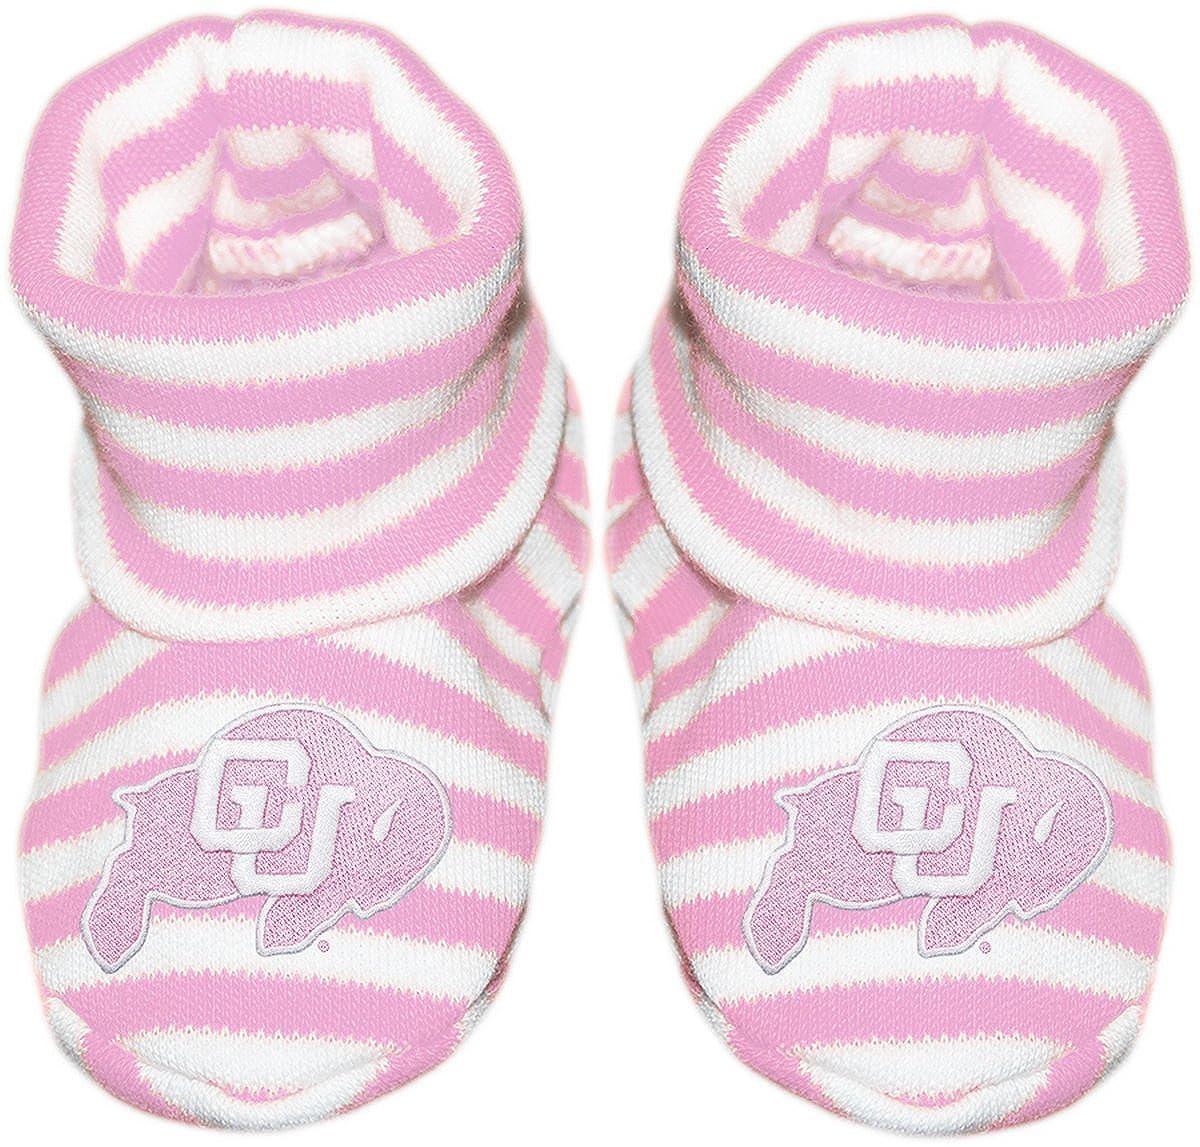 University of Colorado Buffaloes Newborn Baby Striped Bootie Sock